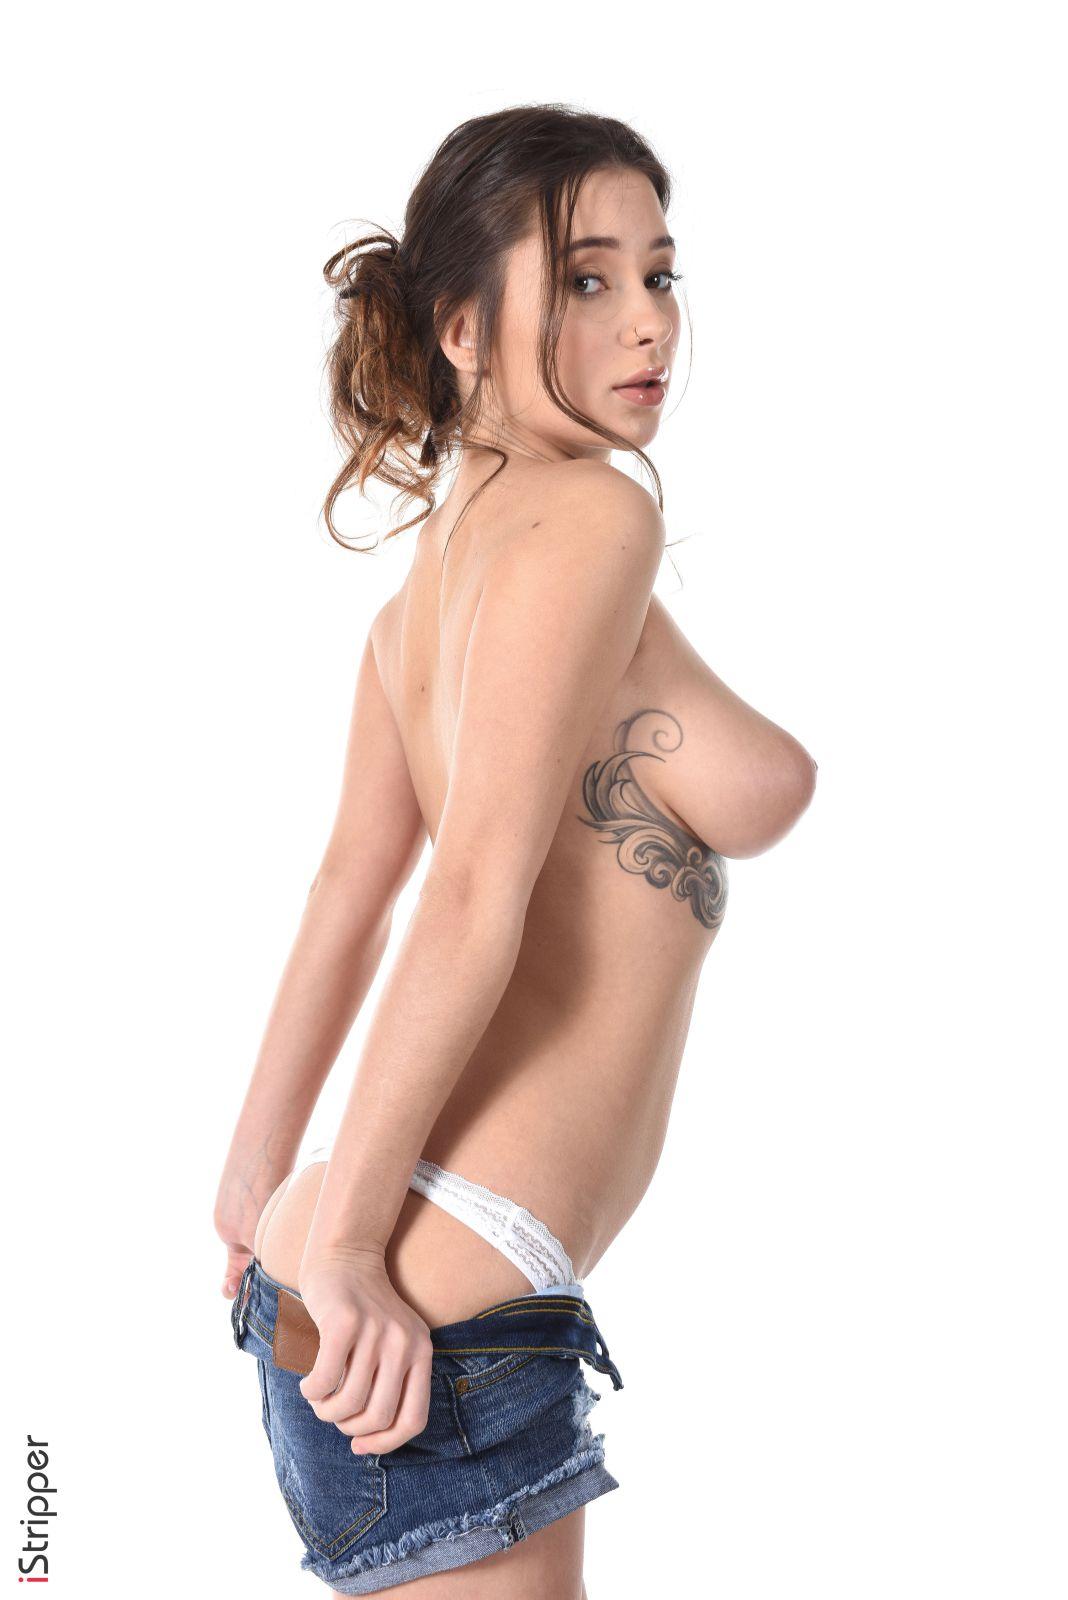 Alexandra Sokova Porn hot russian porn stars | freeones board - the free sex community